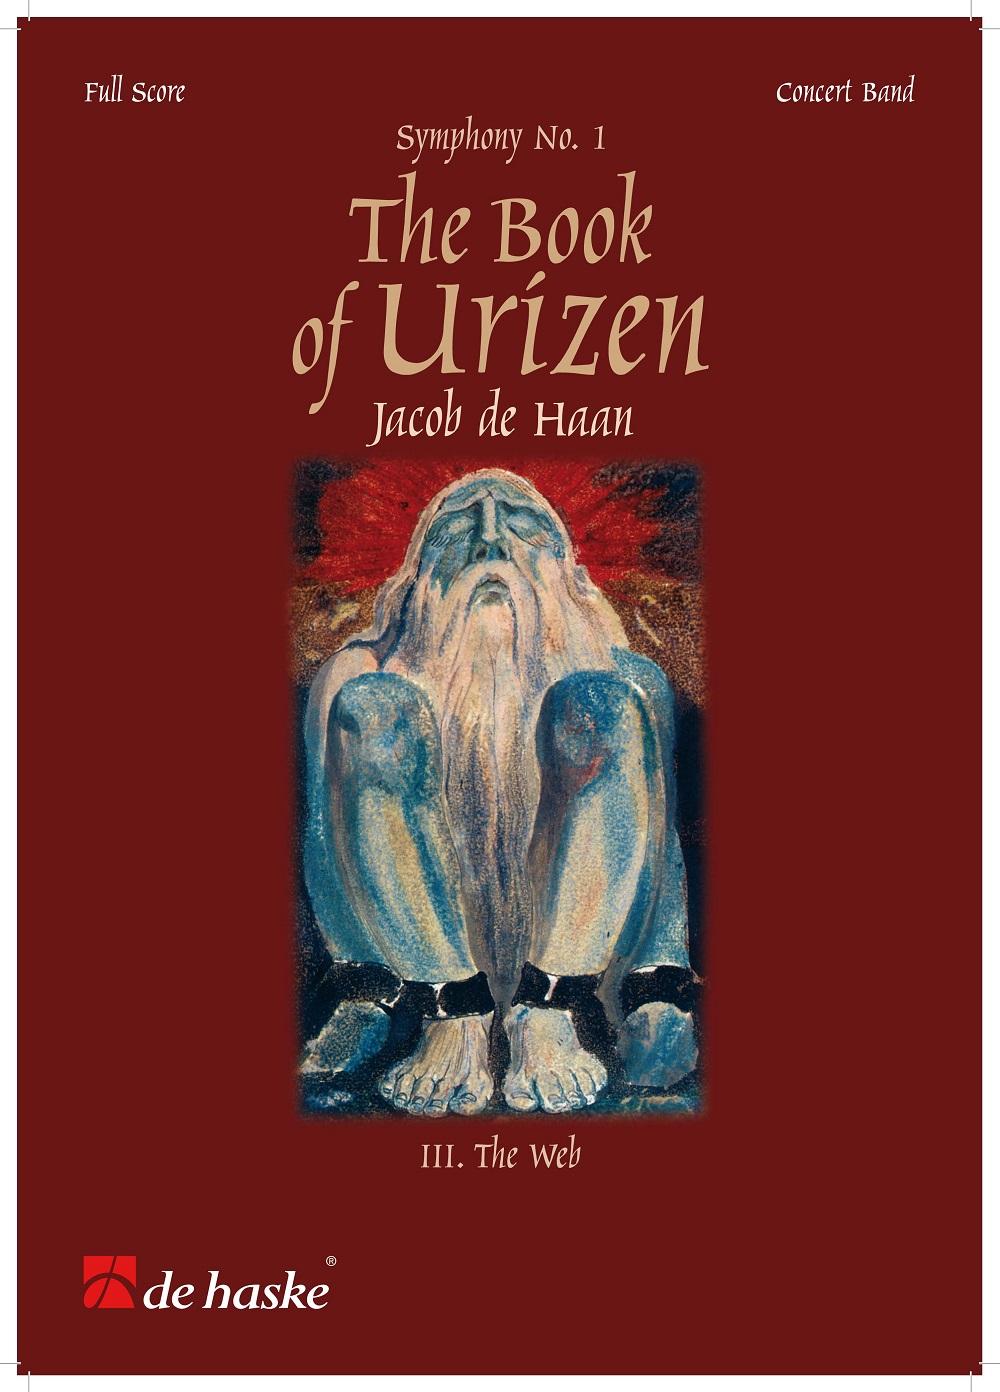 Jacob de Haan: The Book of Urizen - Symphony No. 1: Concert Band: Score